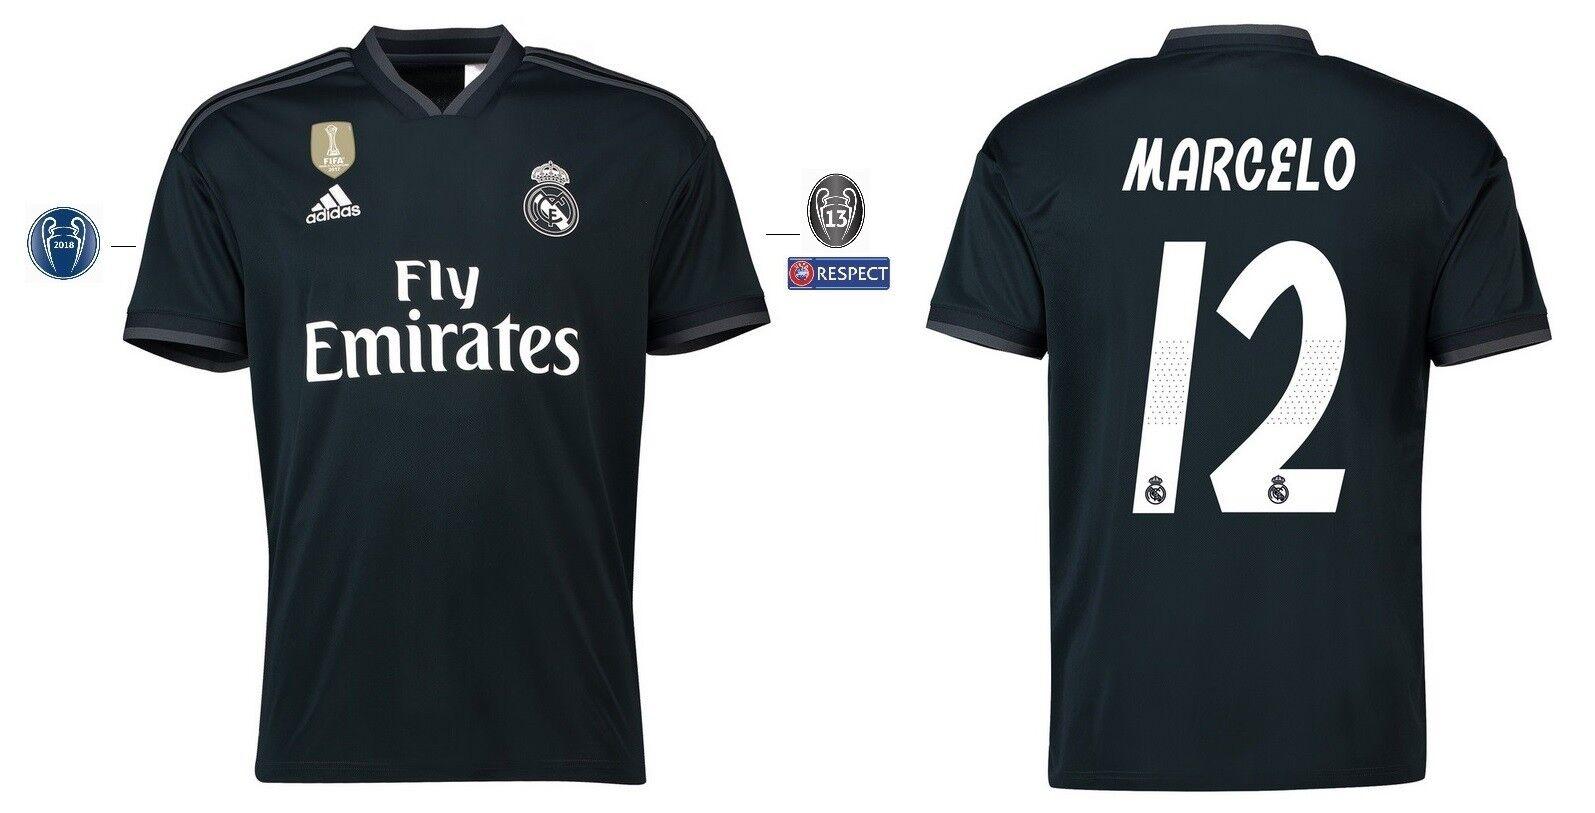 Trikot Adidas Real Madrid 2018-2019 Away UCL - Marcelo 12  Champions